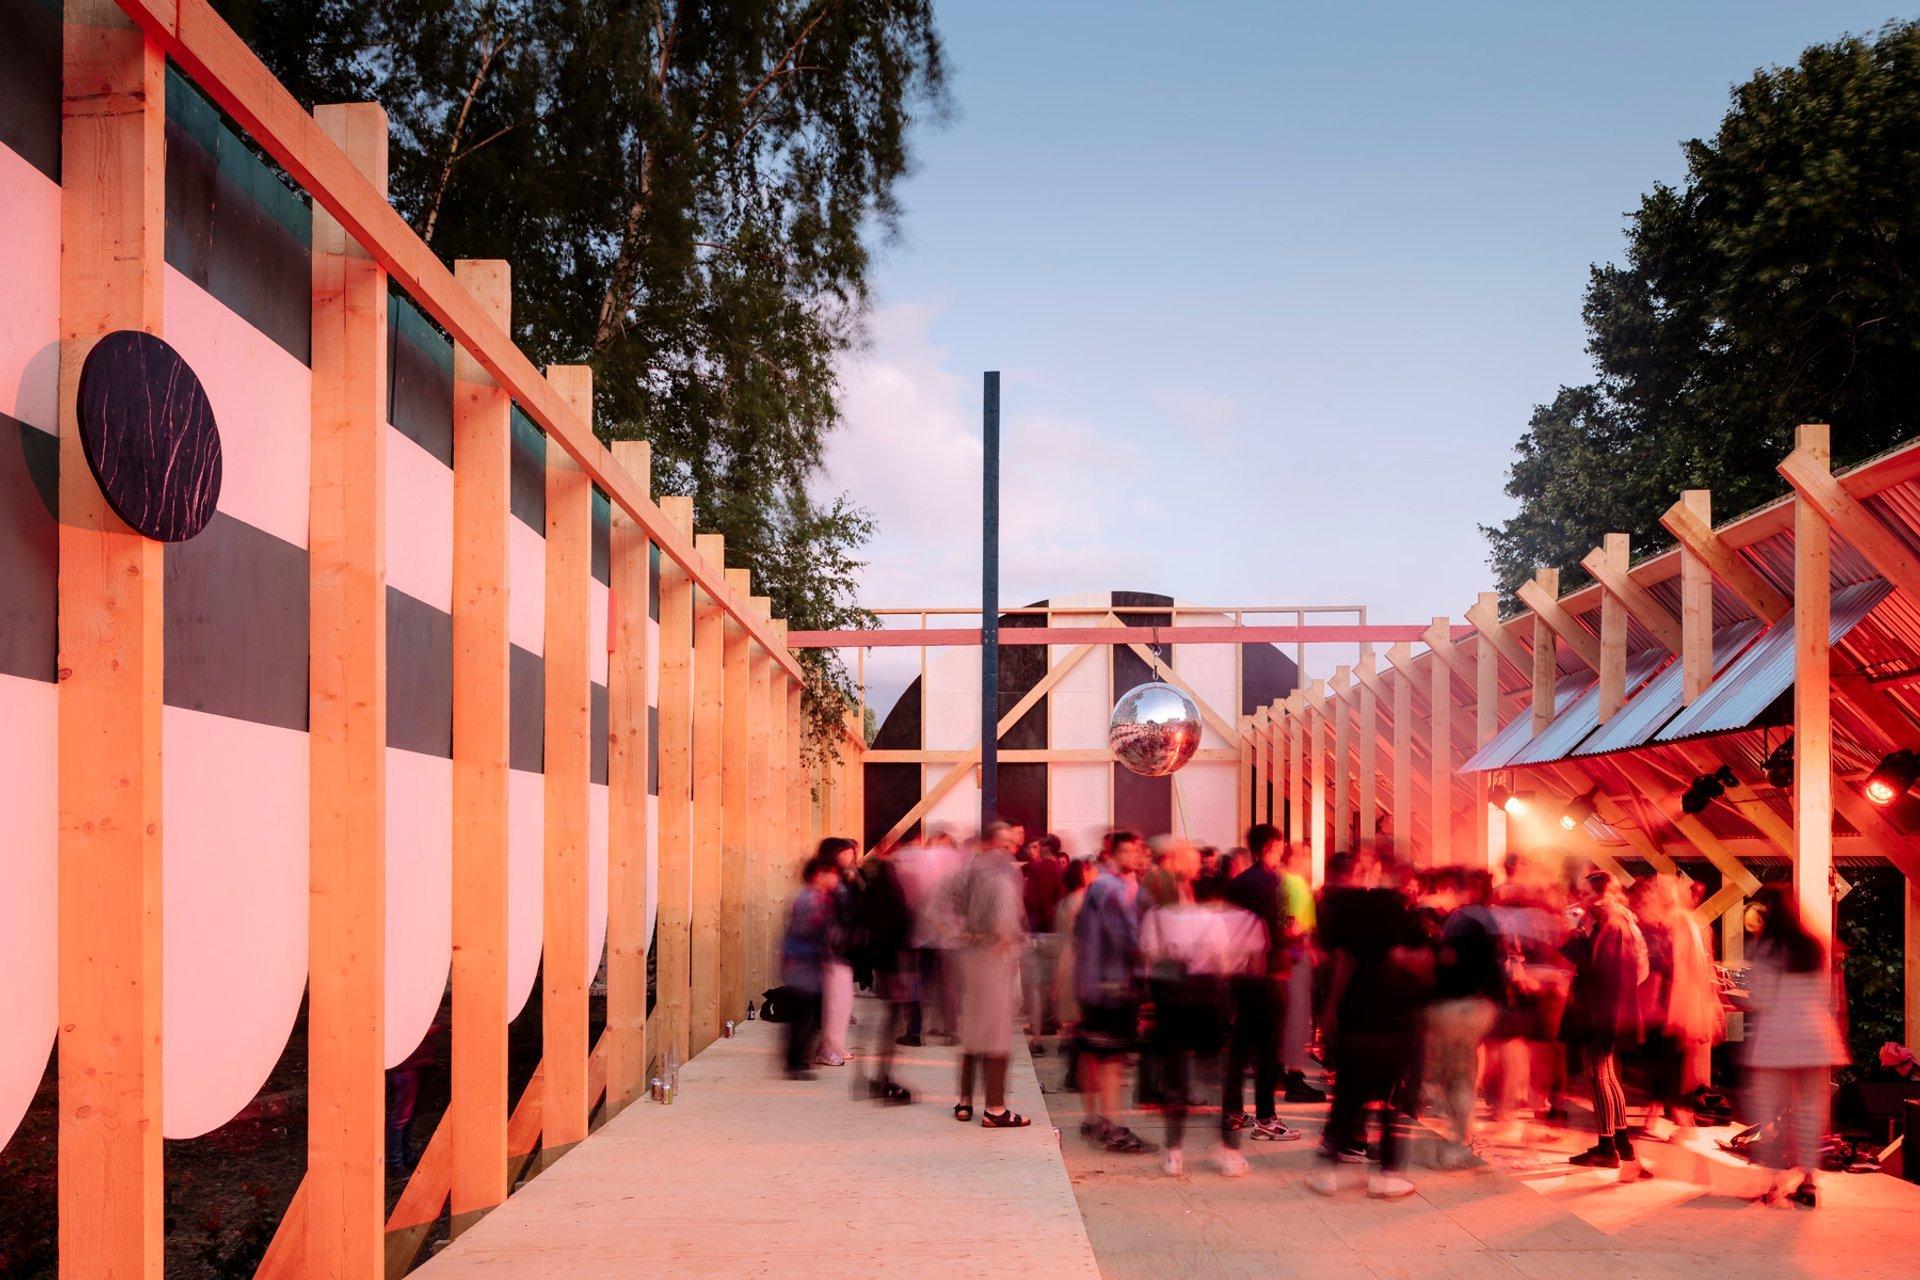 Horst Arts & Music Festival in Belgium 2020 - Best Time